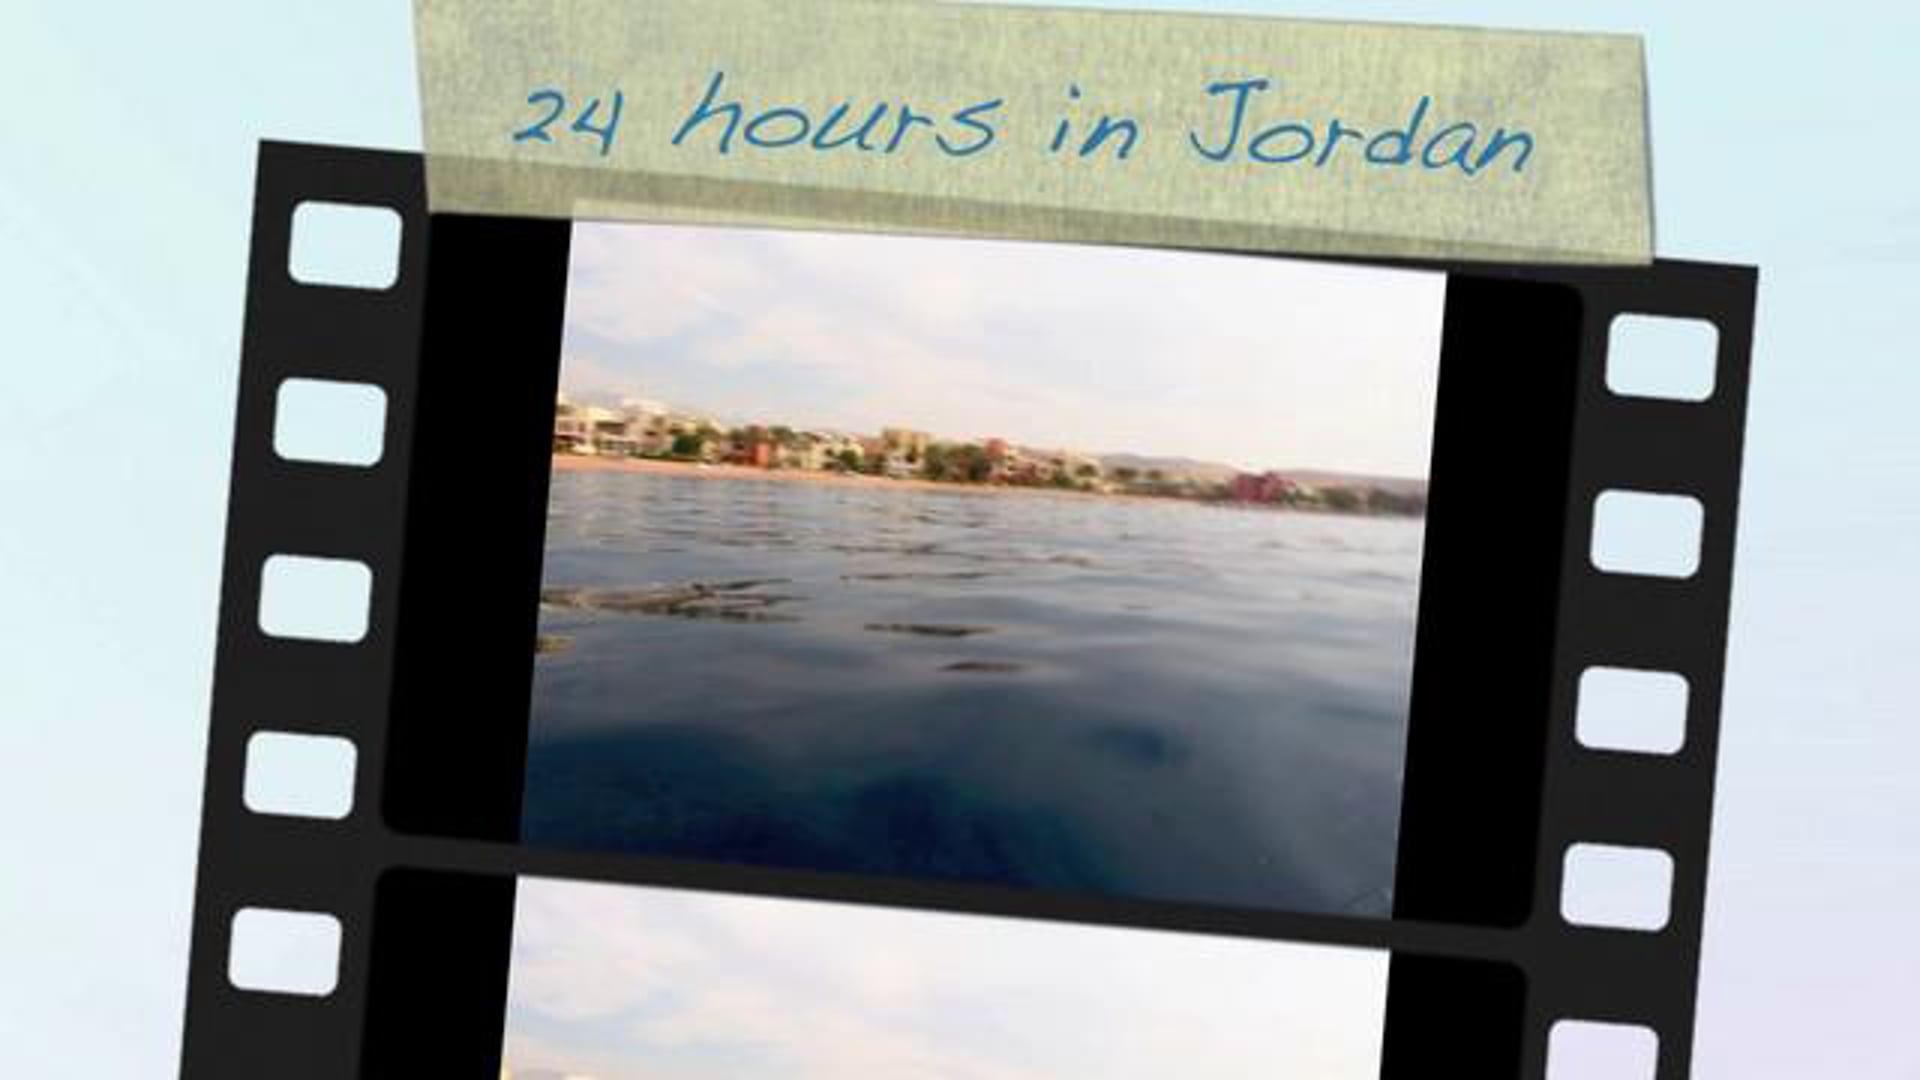 24 hours in Jordan